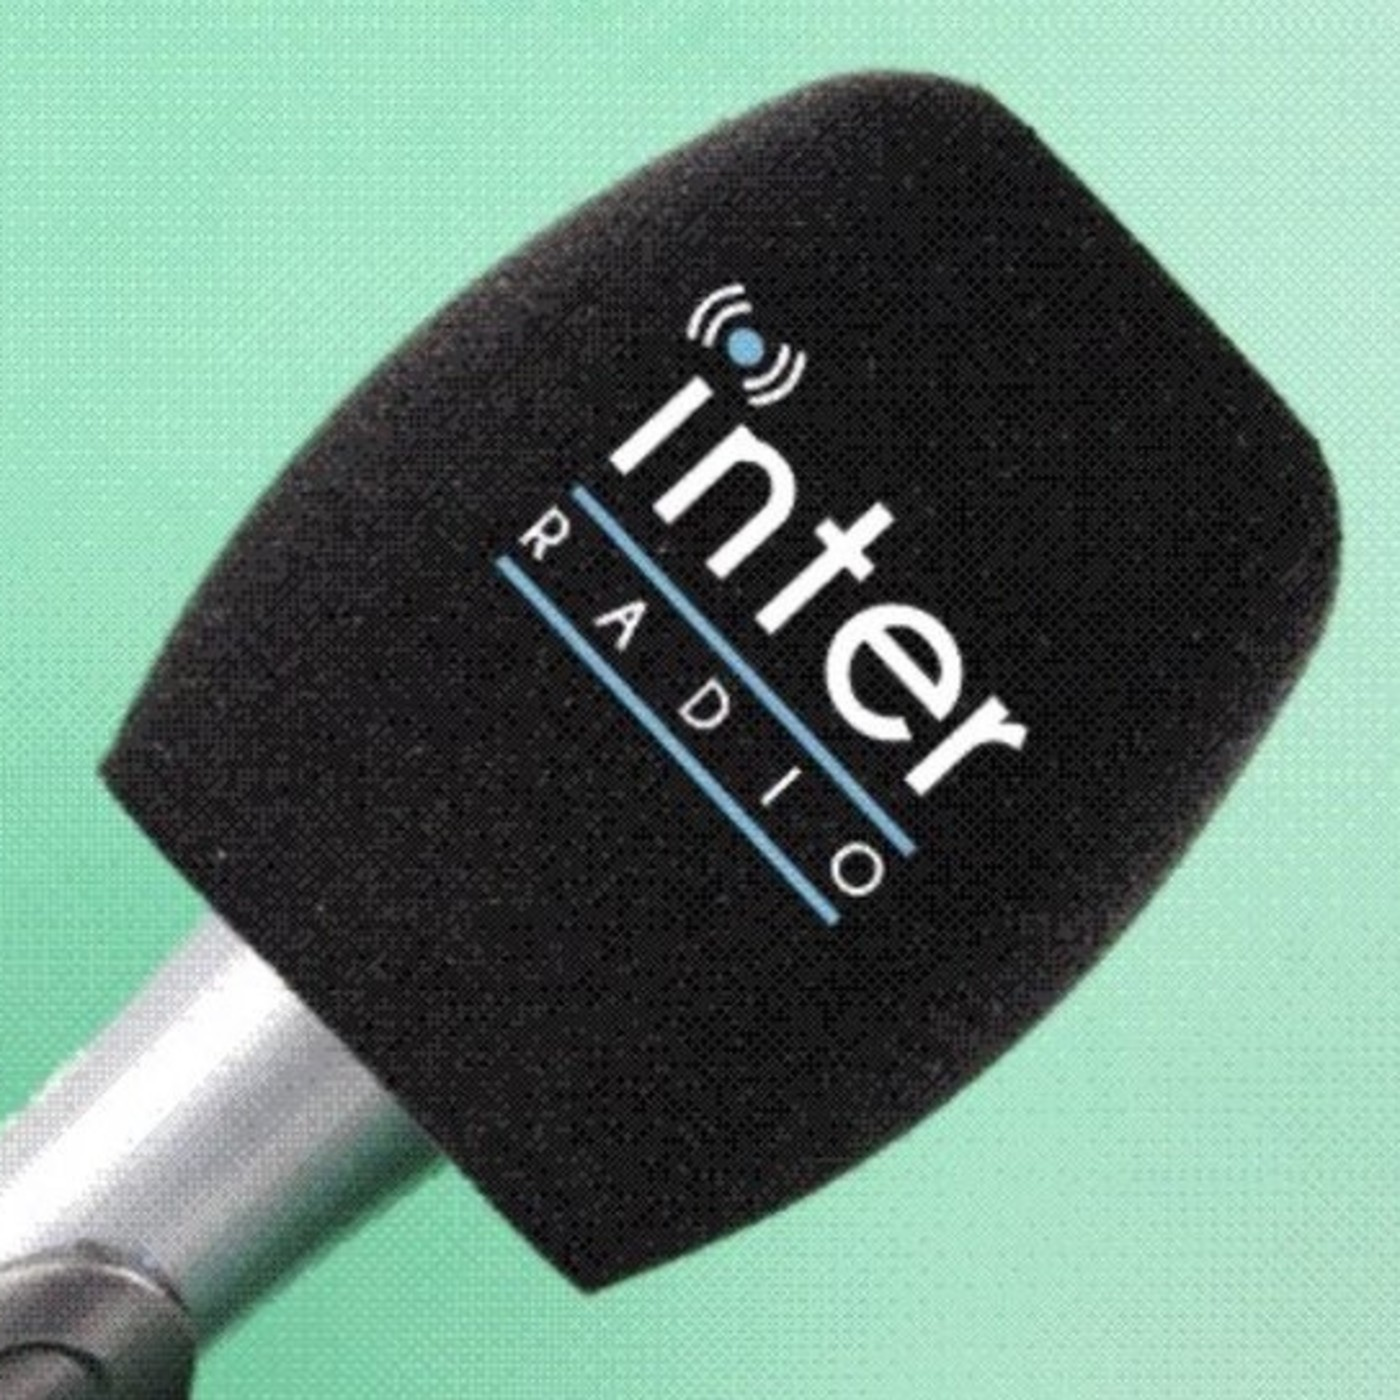 Interdeportivo 02-10-2020